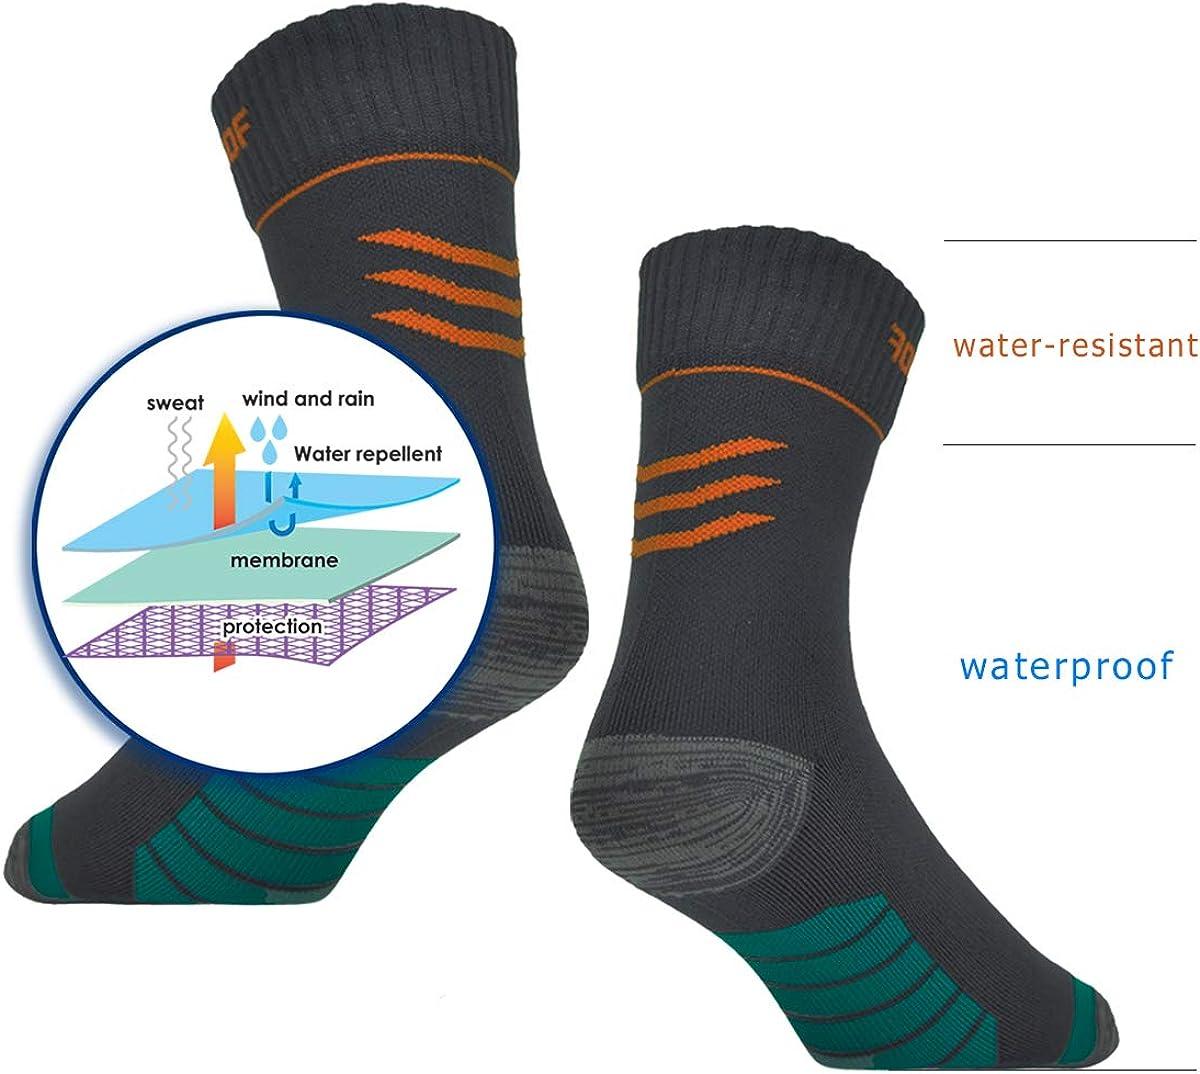 SANASAI Bamboo Waterproof Breathable Hiking-Socks for Men /& Women 1 Pair